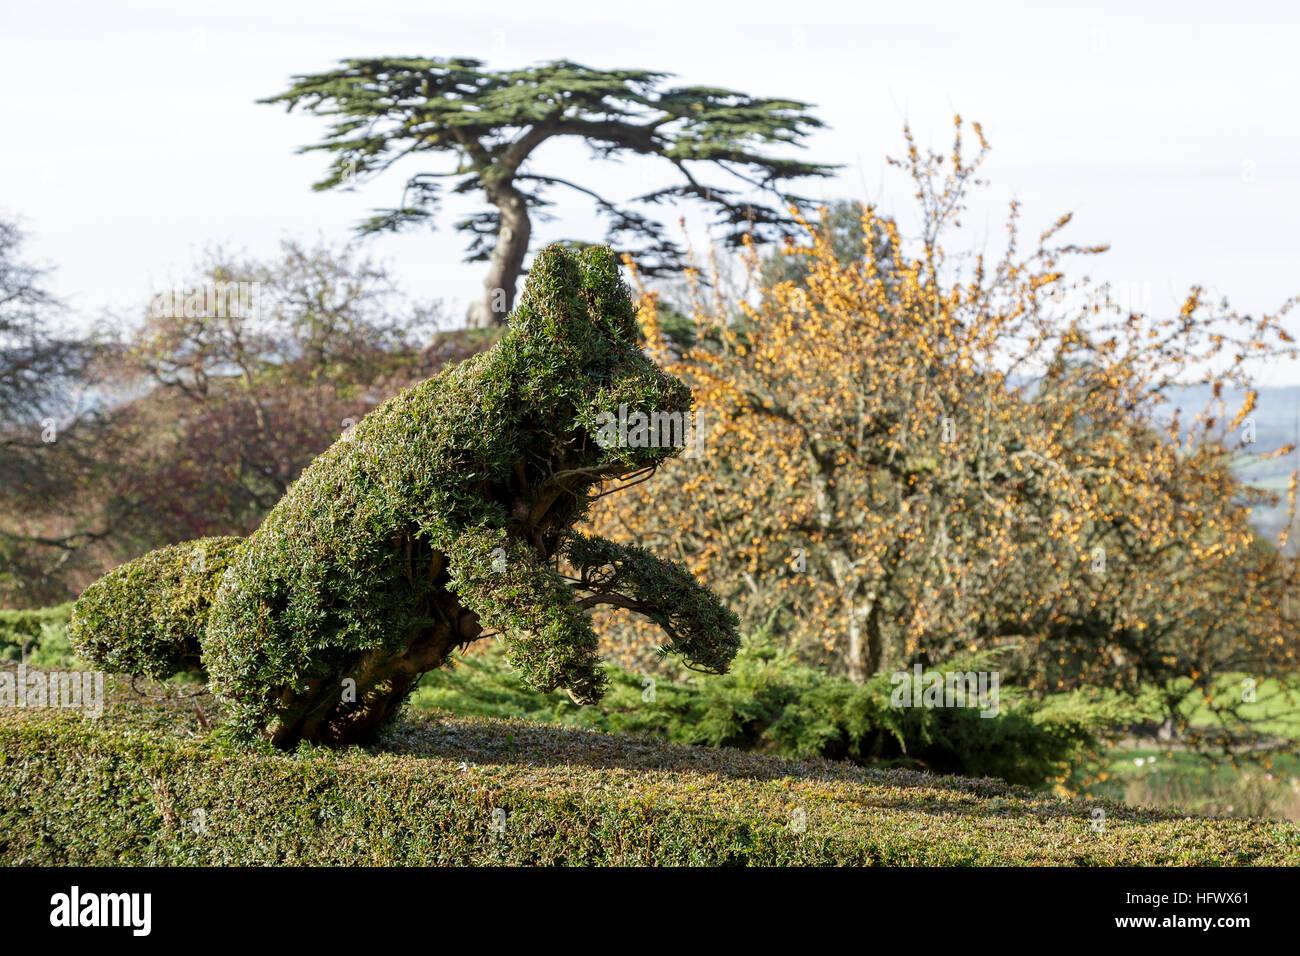 Running fox topiary in Yew hedge - Stock Image